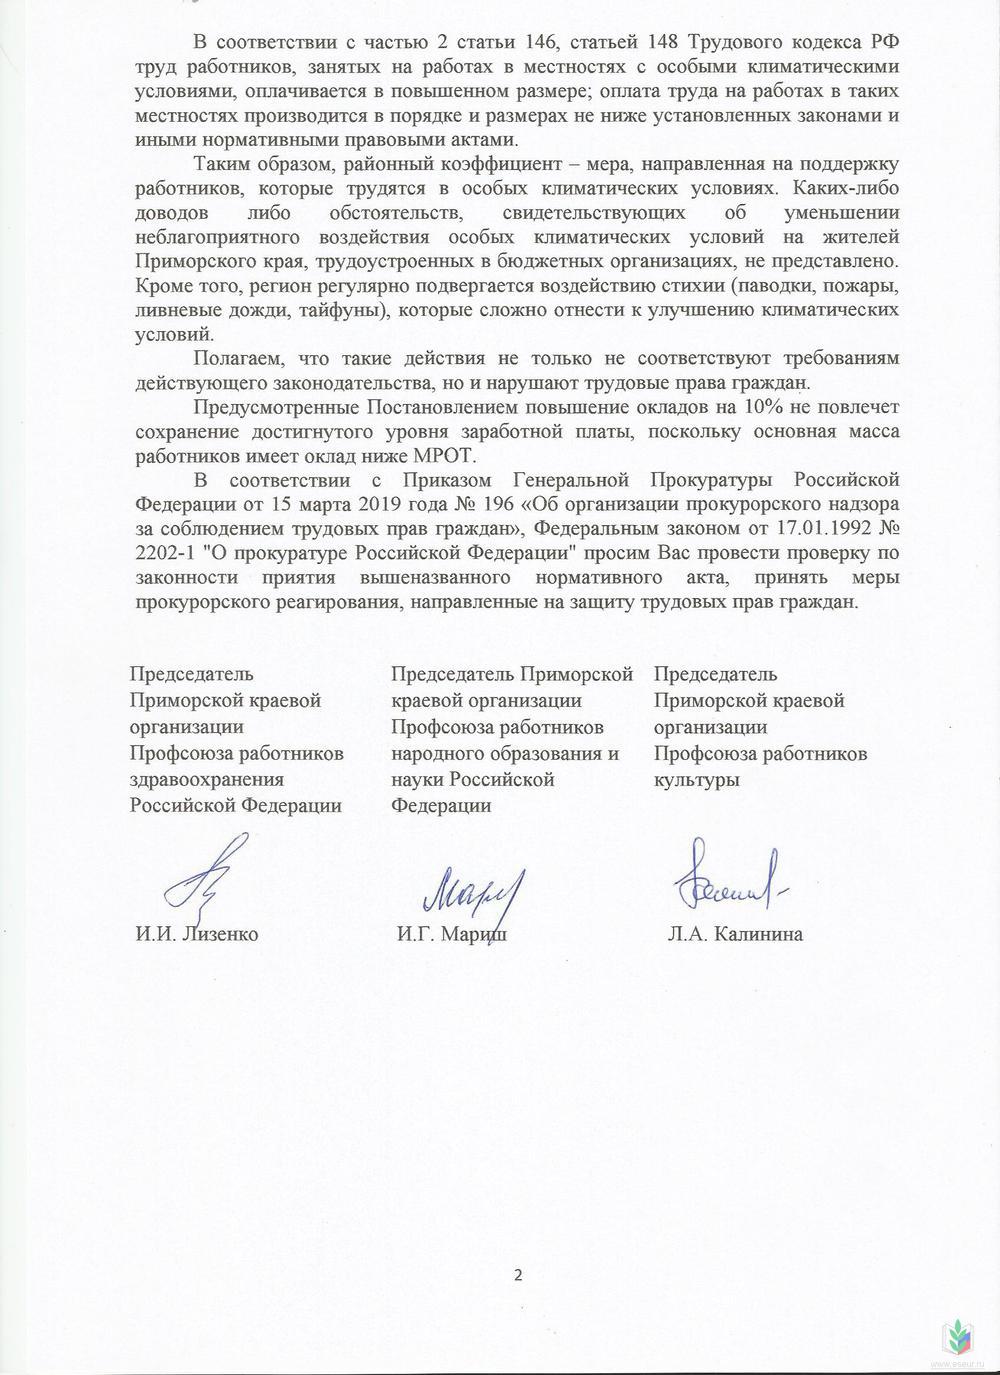 https://www.eseur.ru/Files/file10771.jpg